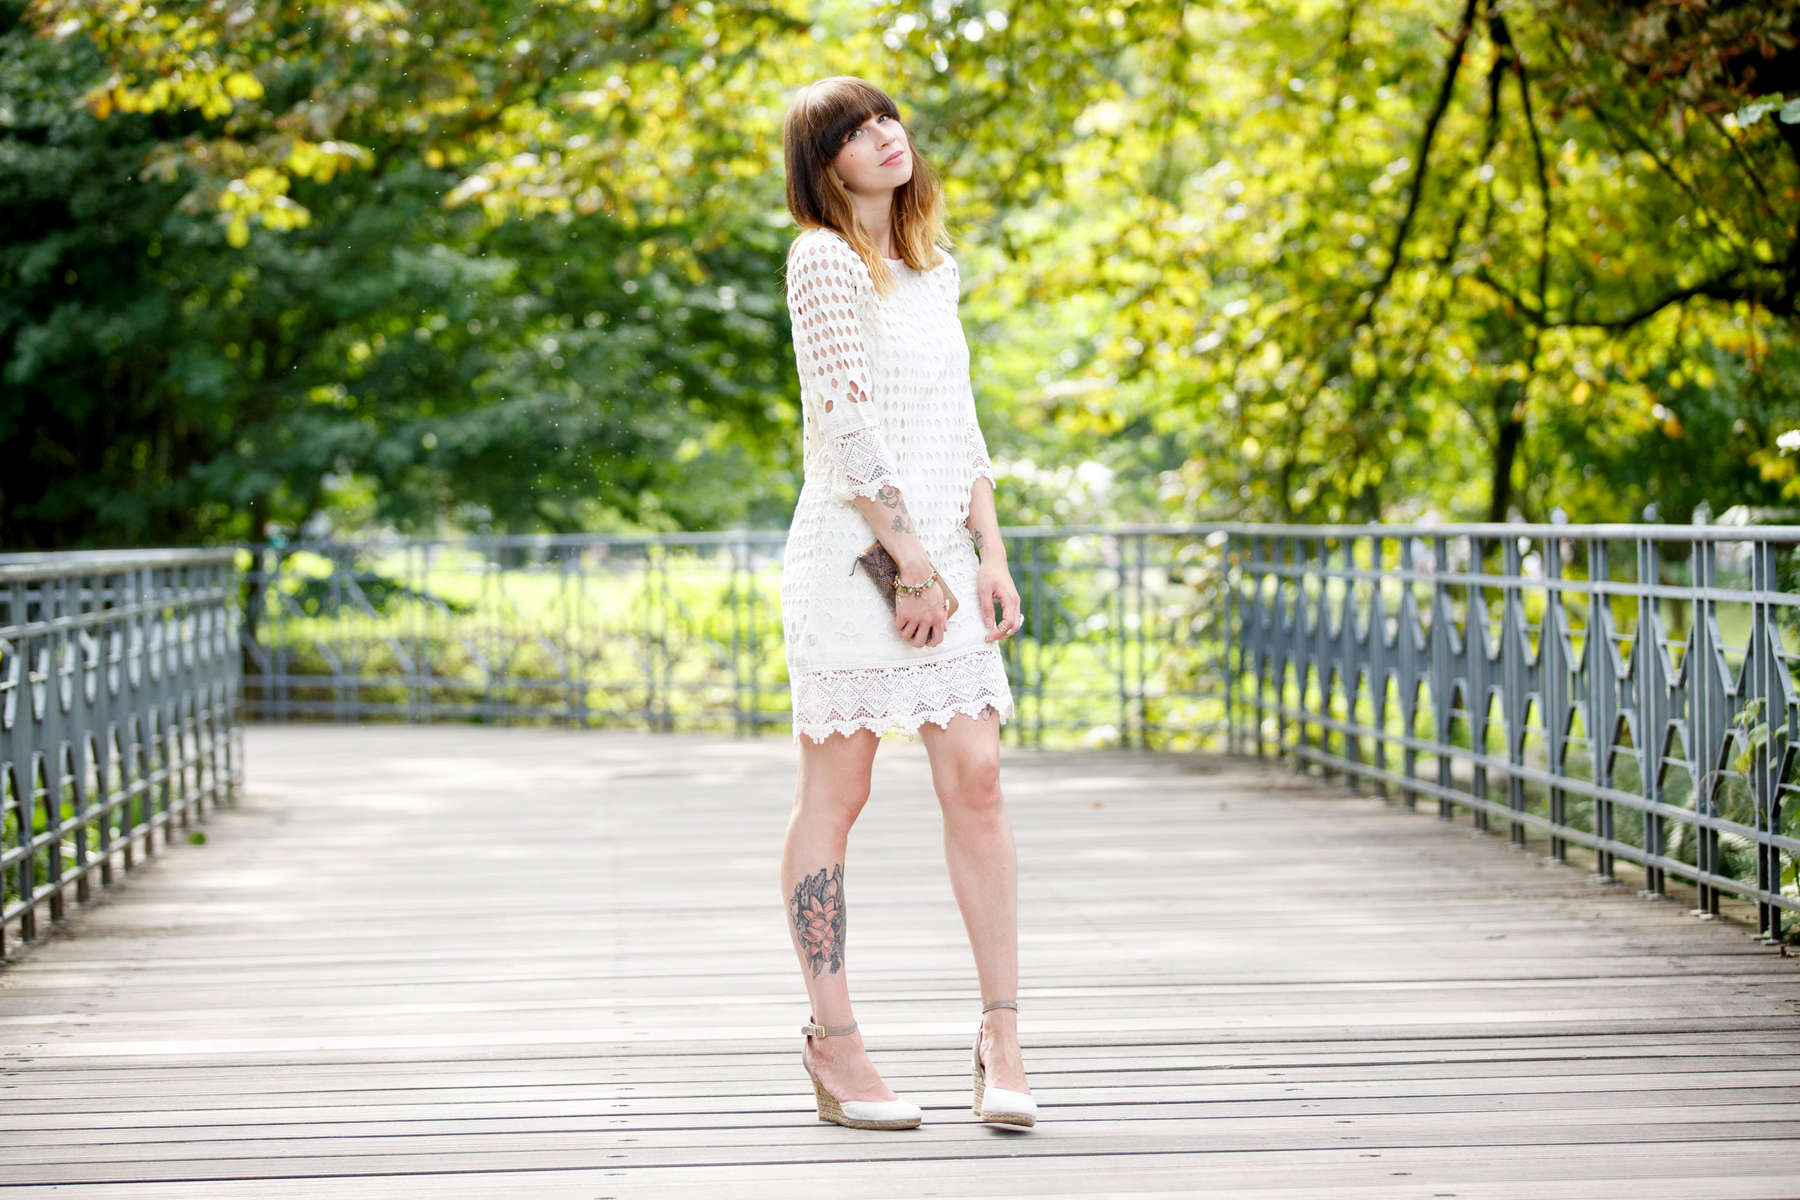 dress-for-less outfit styling white sommerkleid summer look crochet wrangler hilfiger fashion blog germany düsseldorf ricarda schernus cats & dogs 6